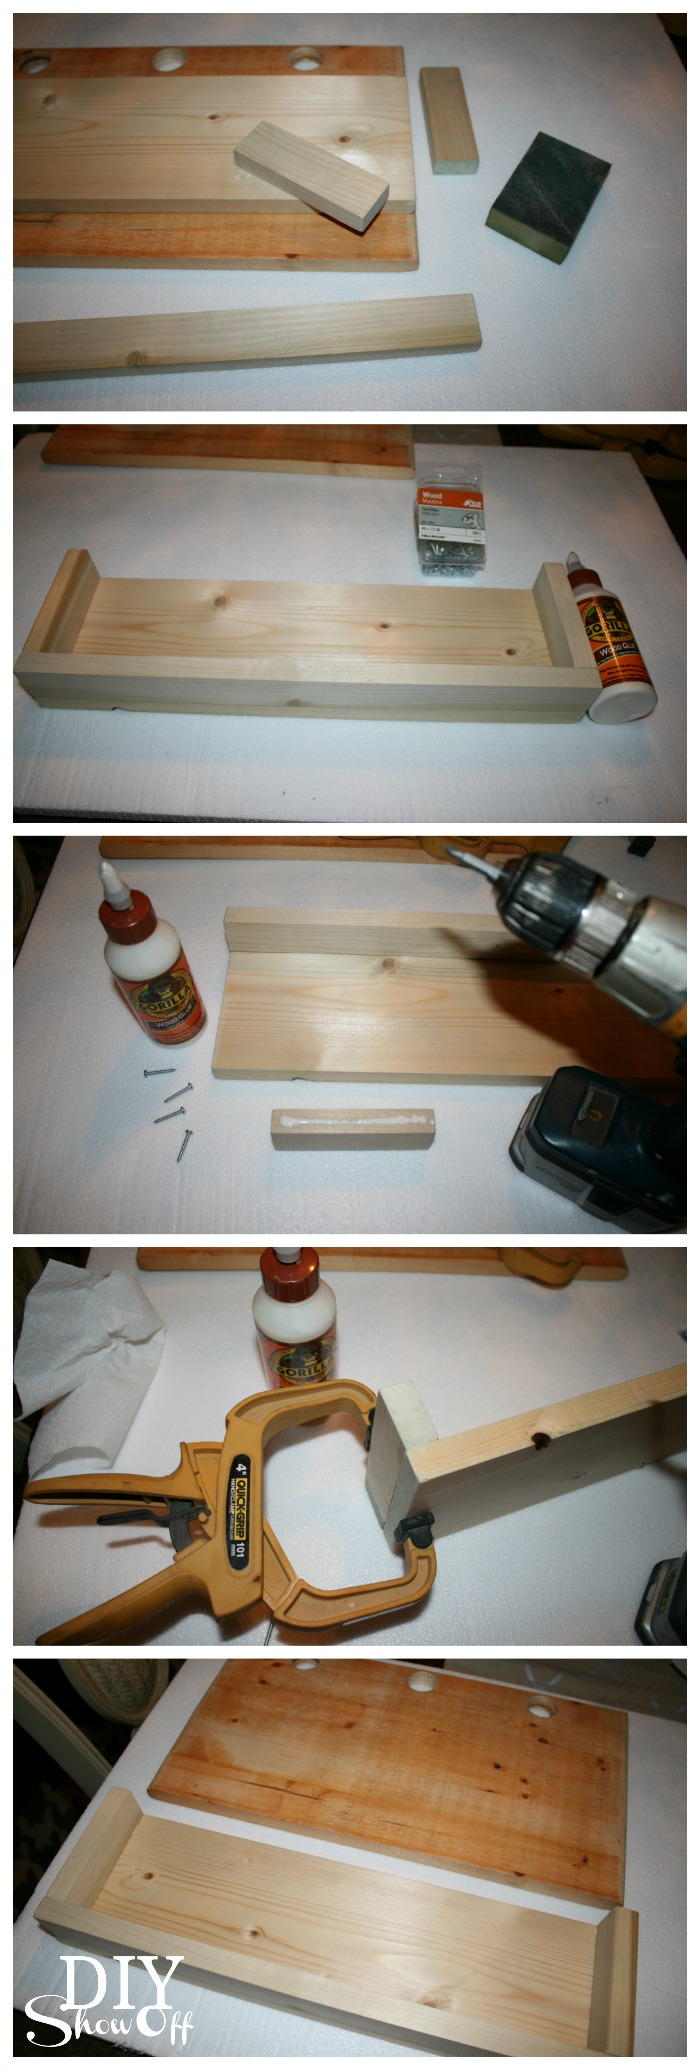 DIY peg hook caddy tutorial